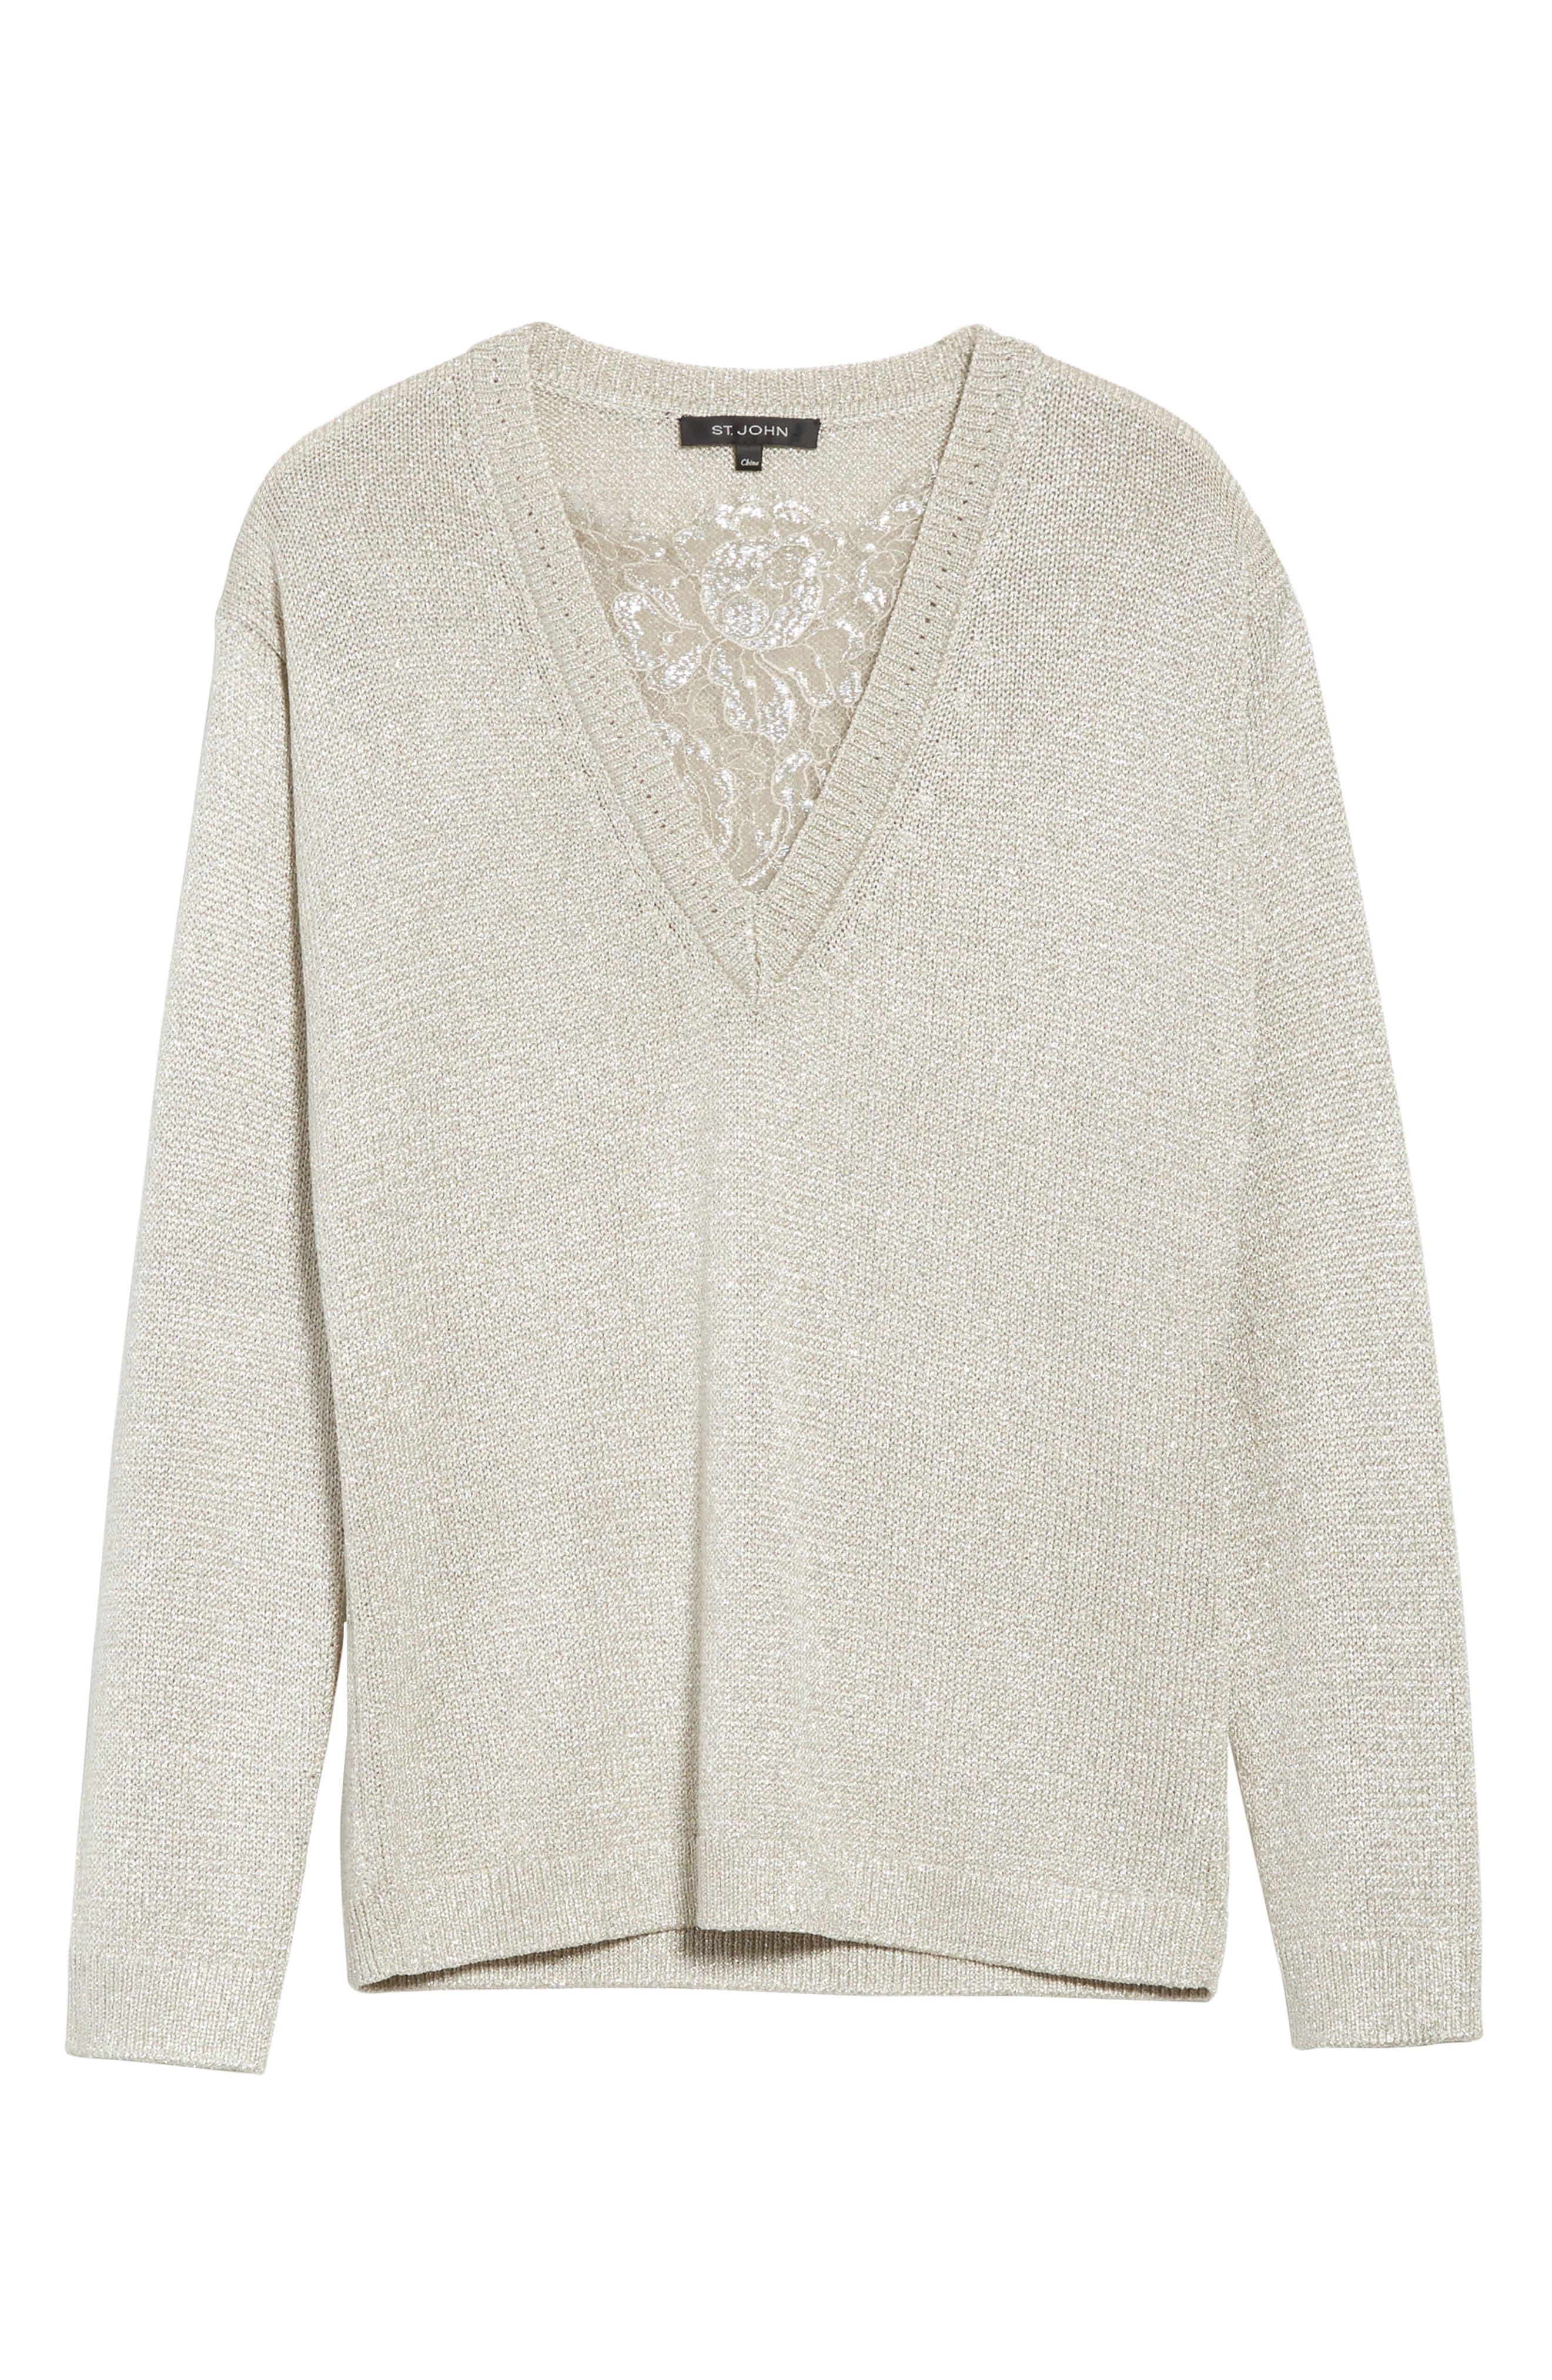 St John Collection Metallic Jersey Knit Sweater,                             Alternate thumbnail 6, color,                             020